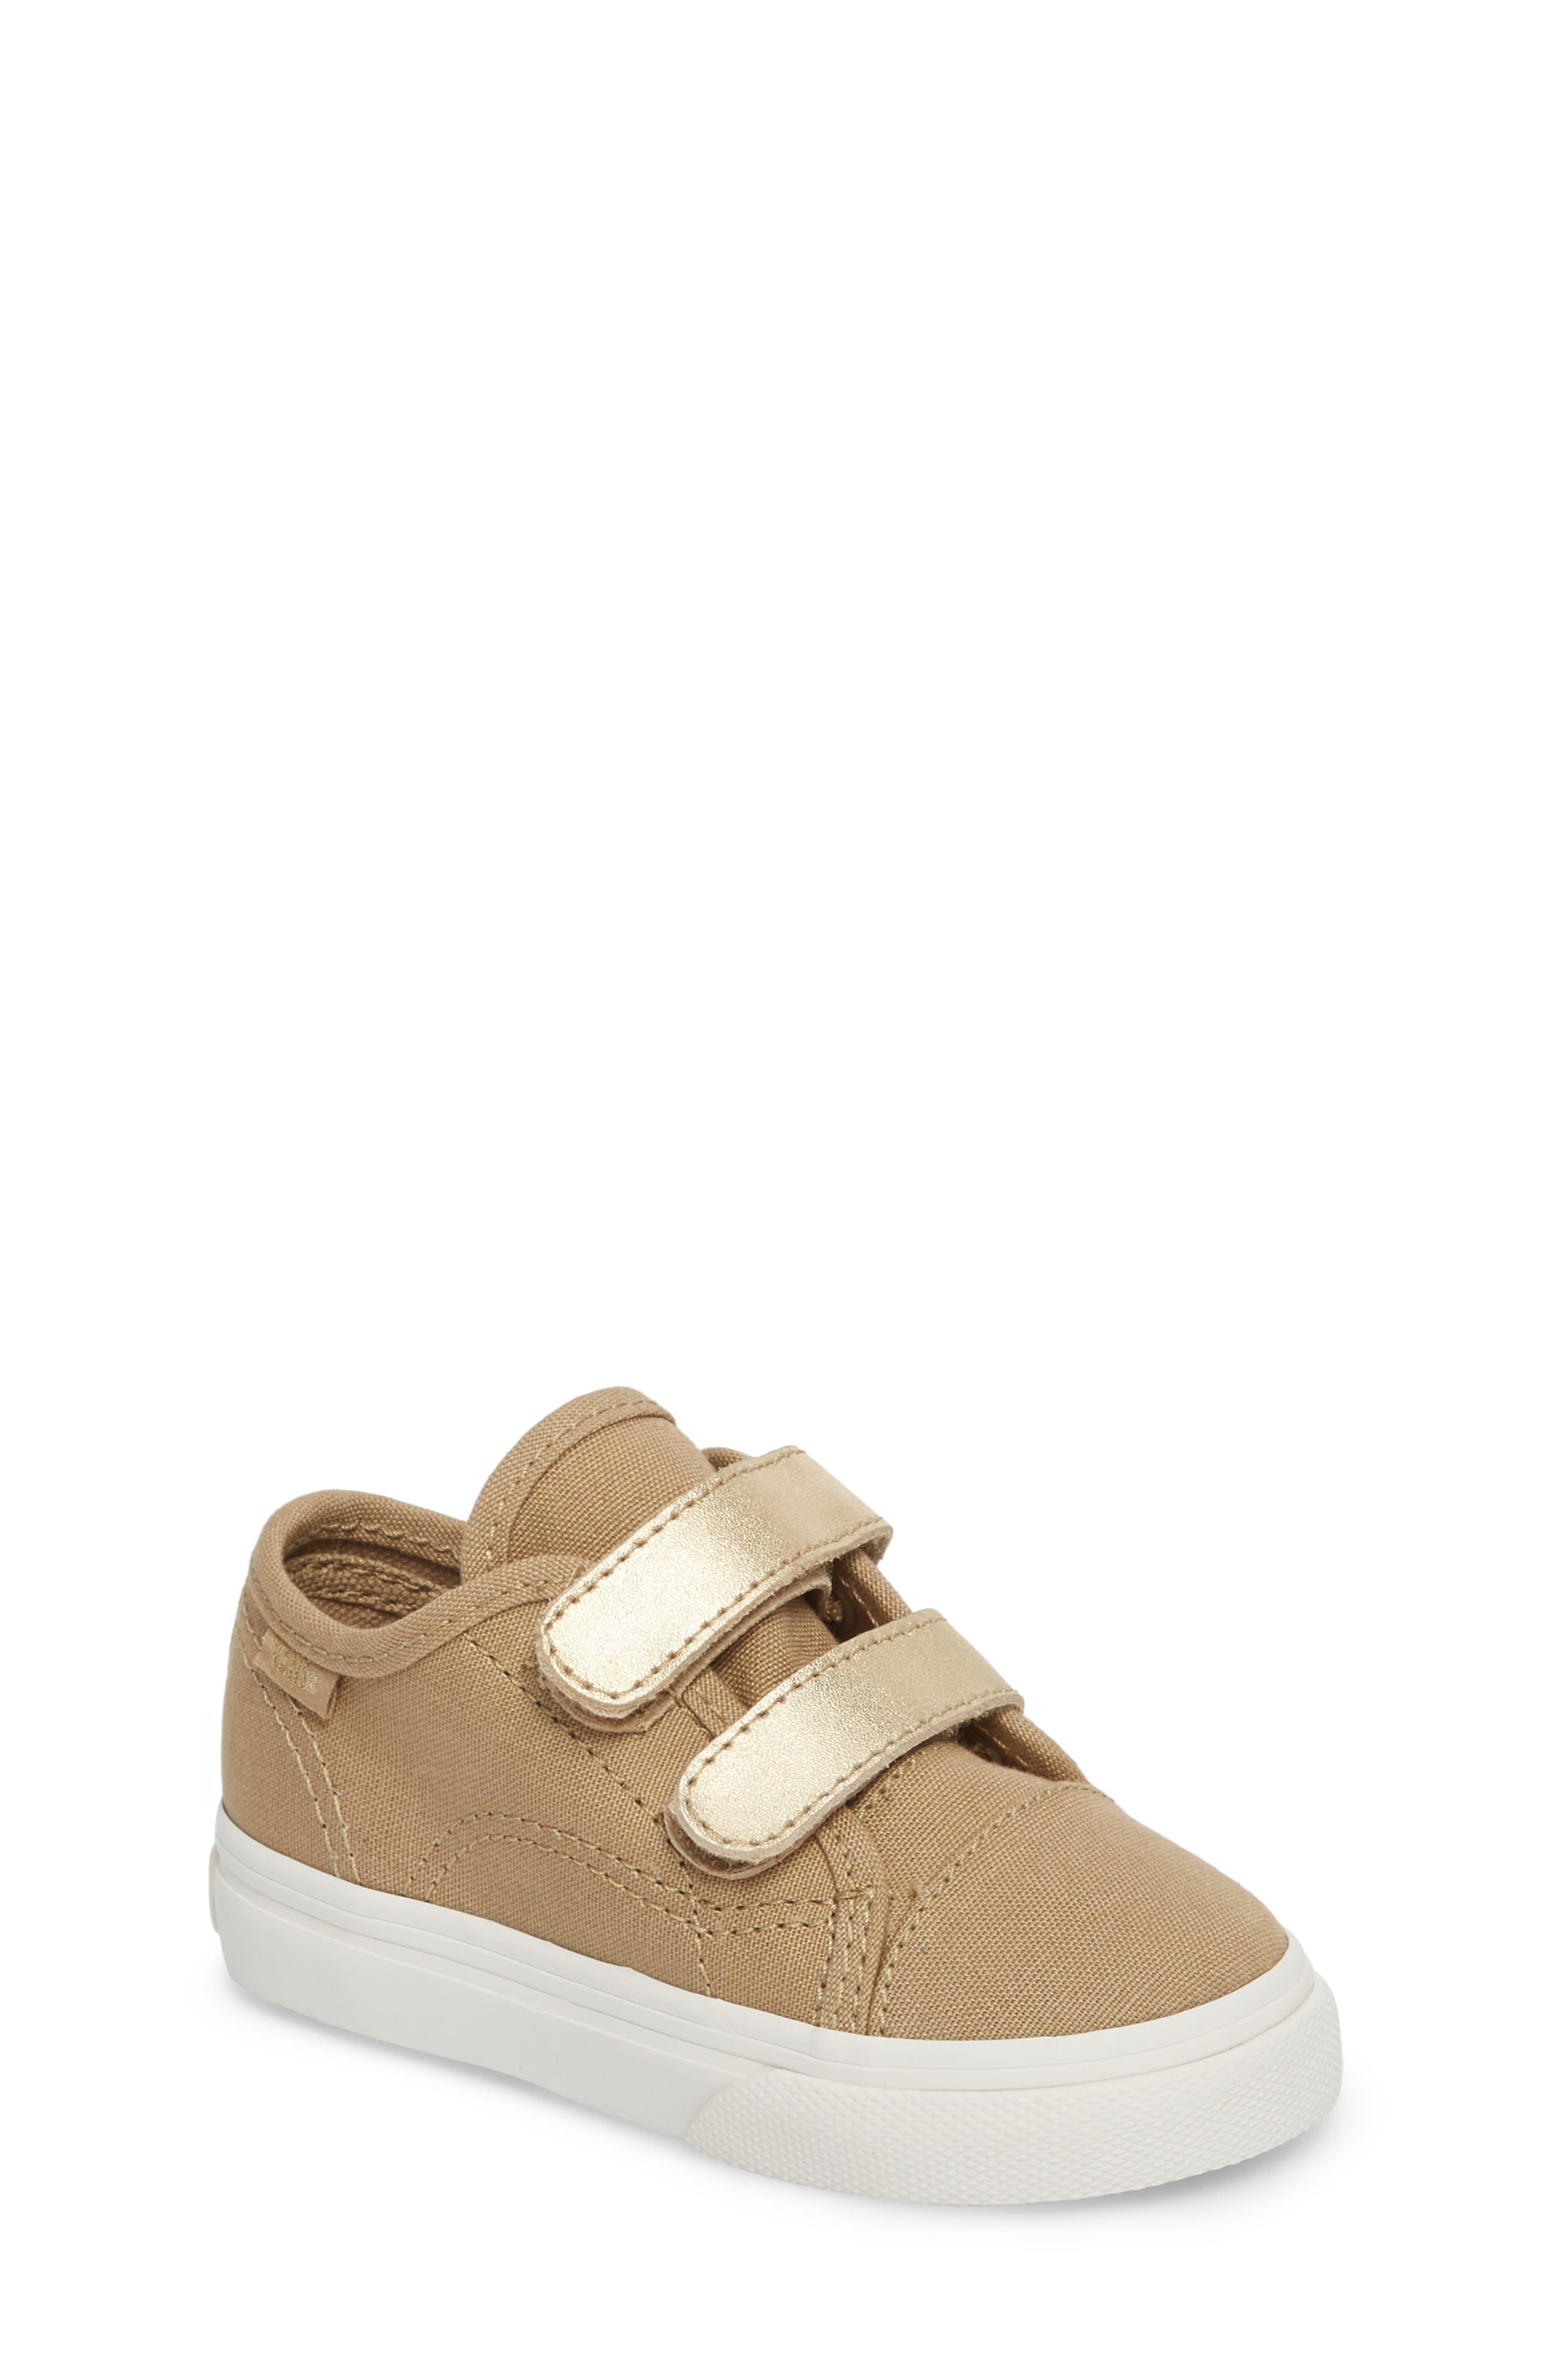 Style 23 V Sneaker,                         Main,                         color, Metallic/ Cornstalk